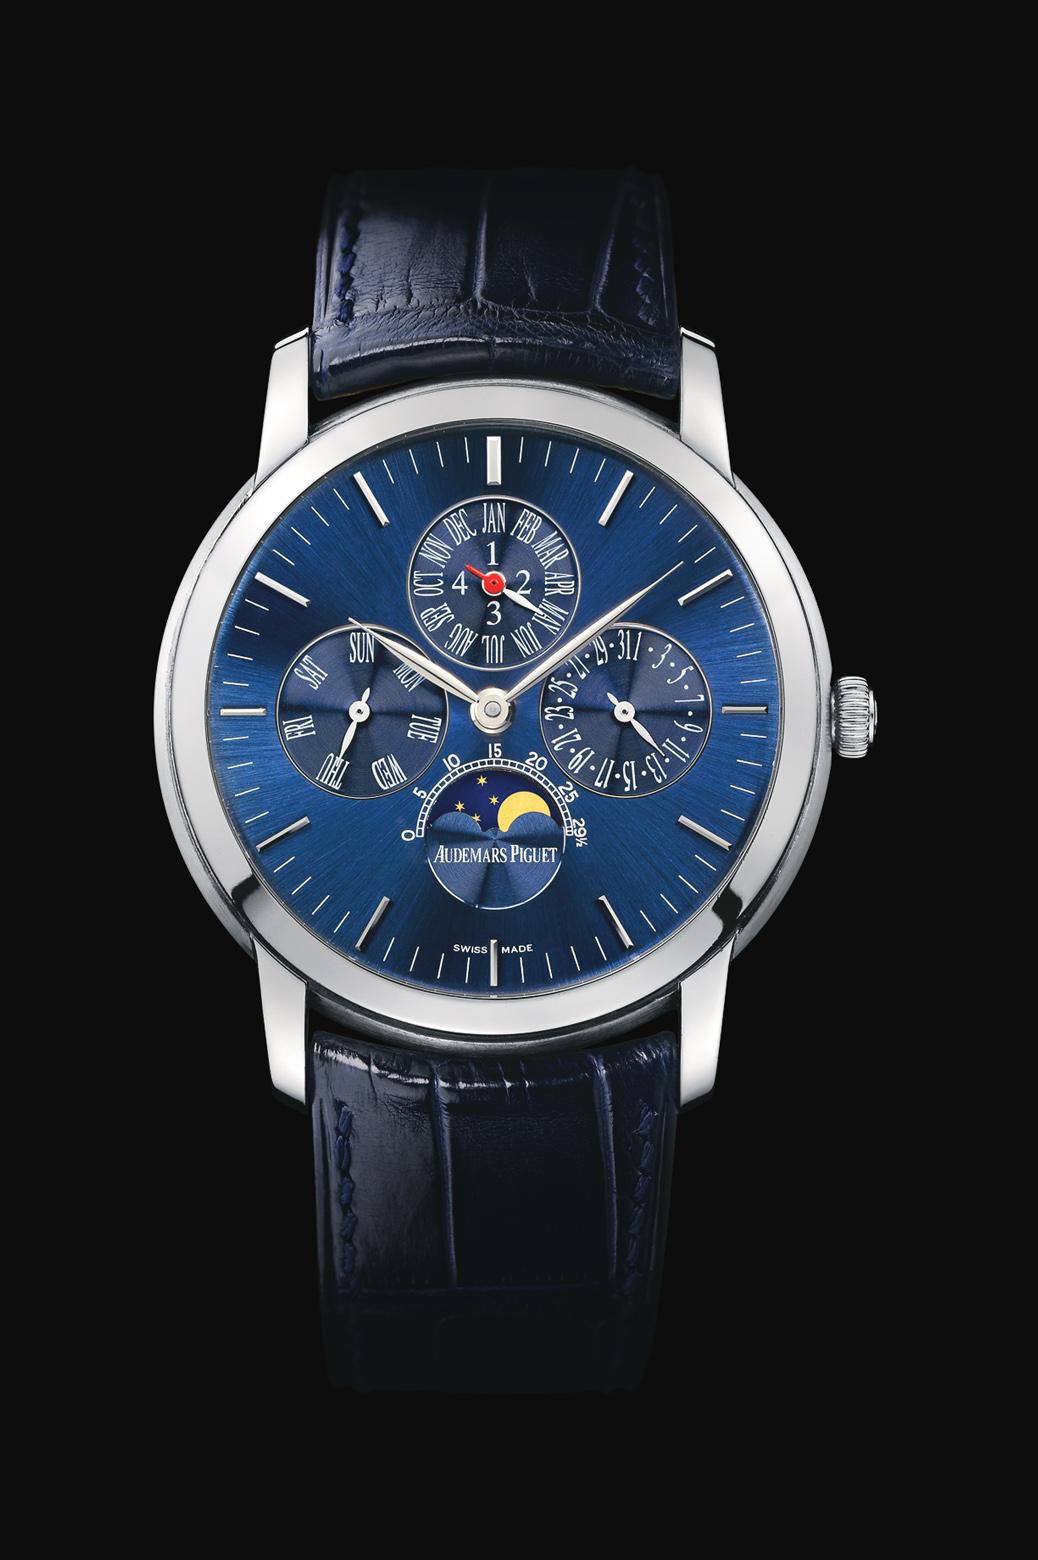 часы Audemars Piguet Jules Audemars Perpetual 30th Anniversary